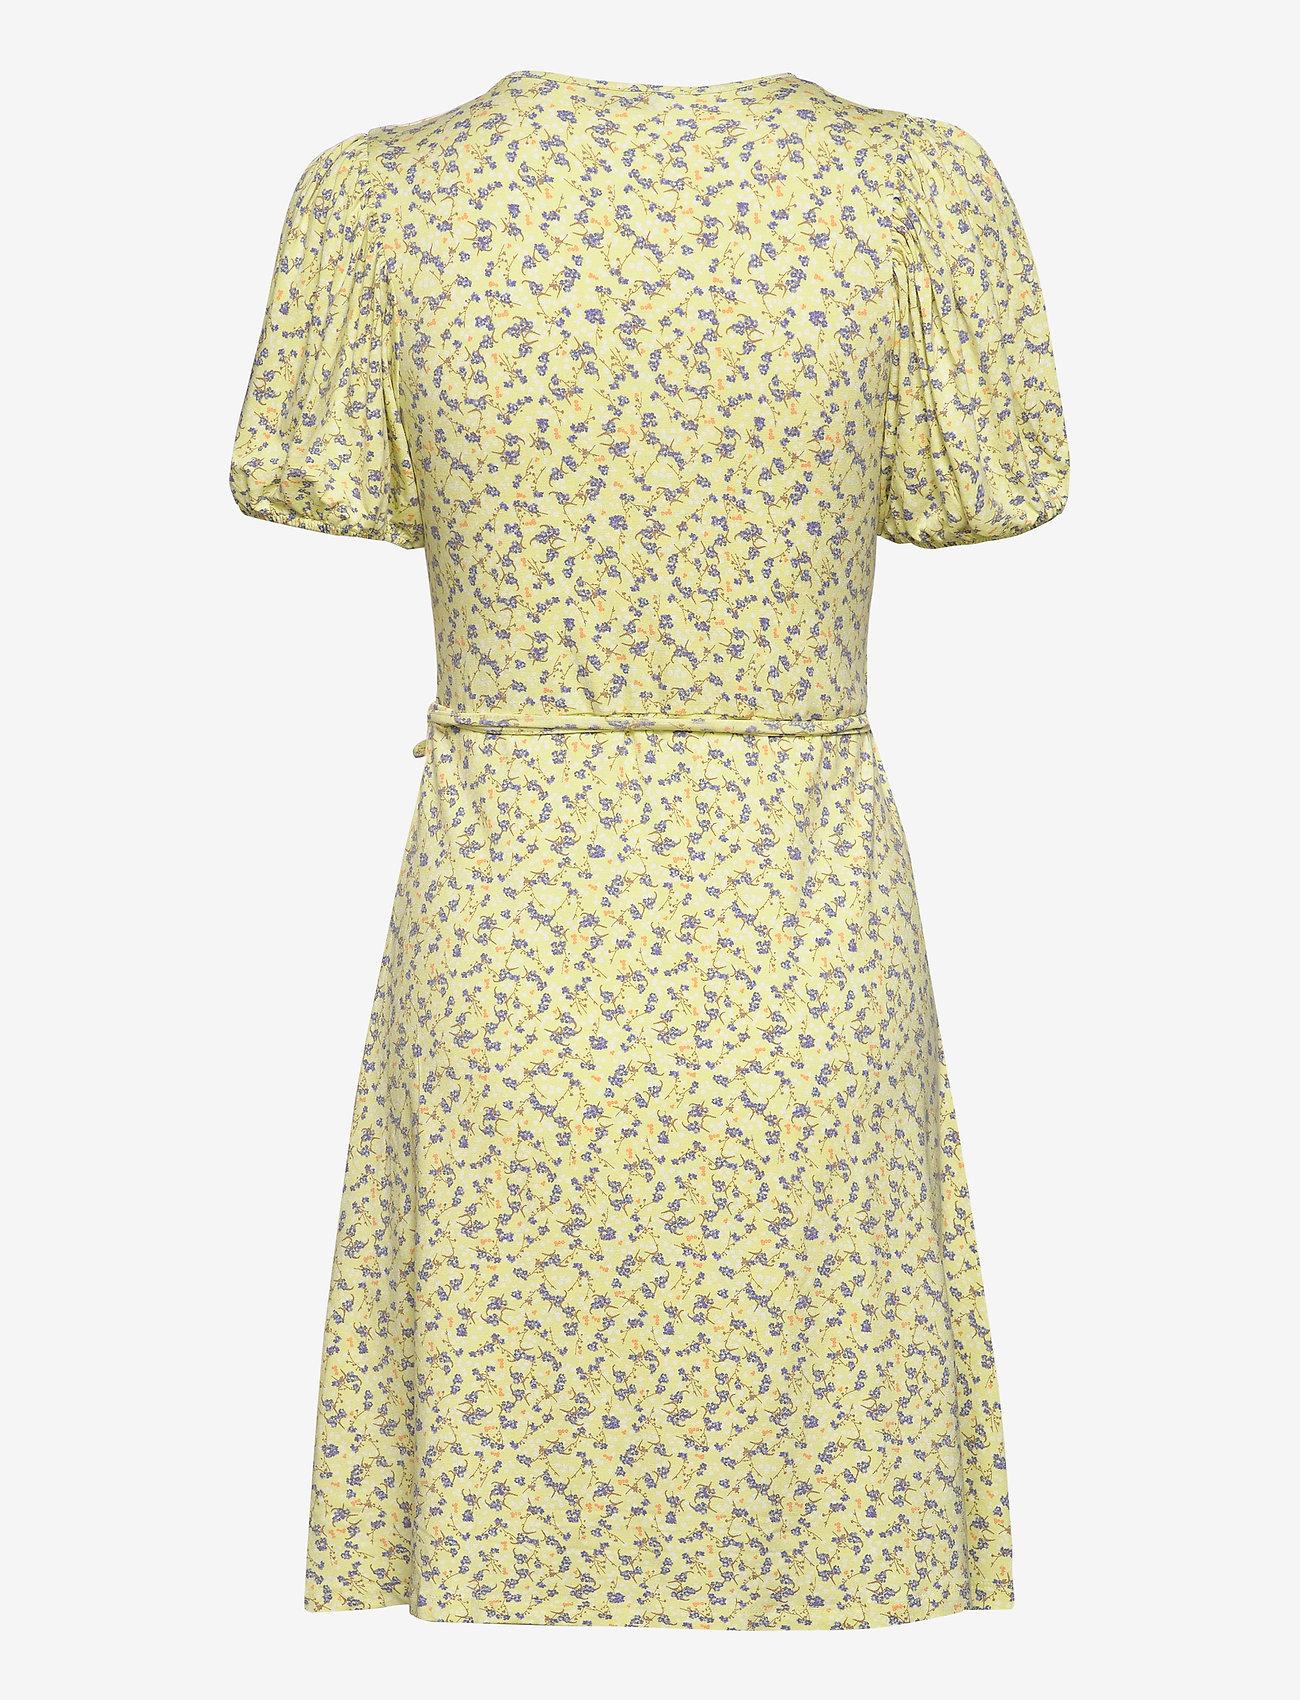 Enmanon Ss V-n Dress Aop 5329 (Summer Grass) - Envii Jq4PFF